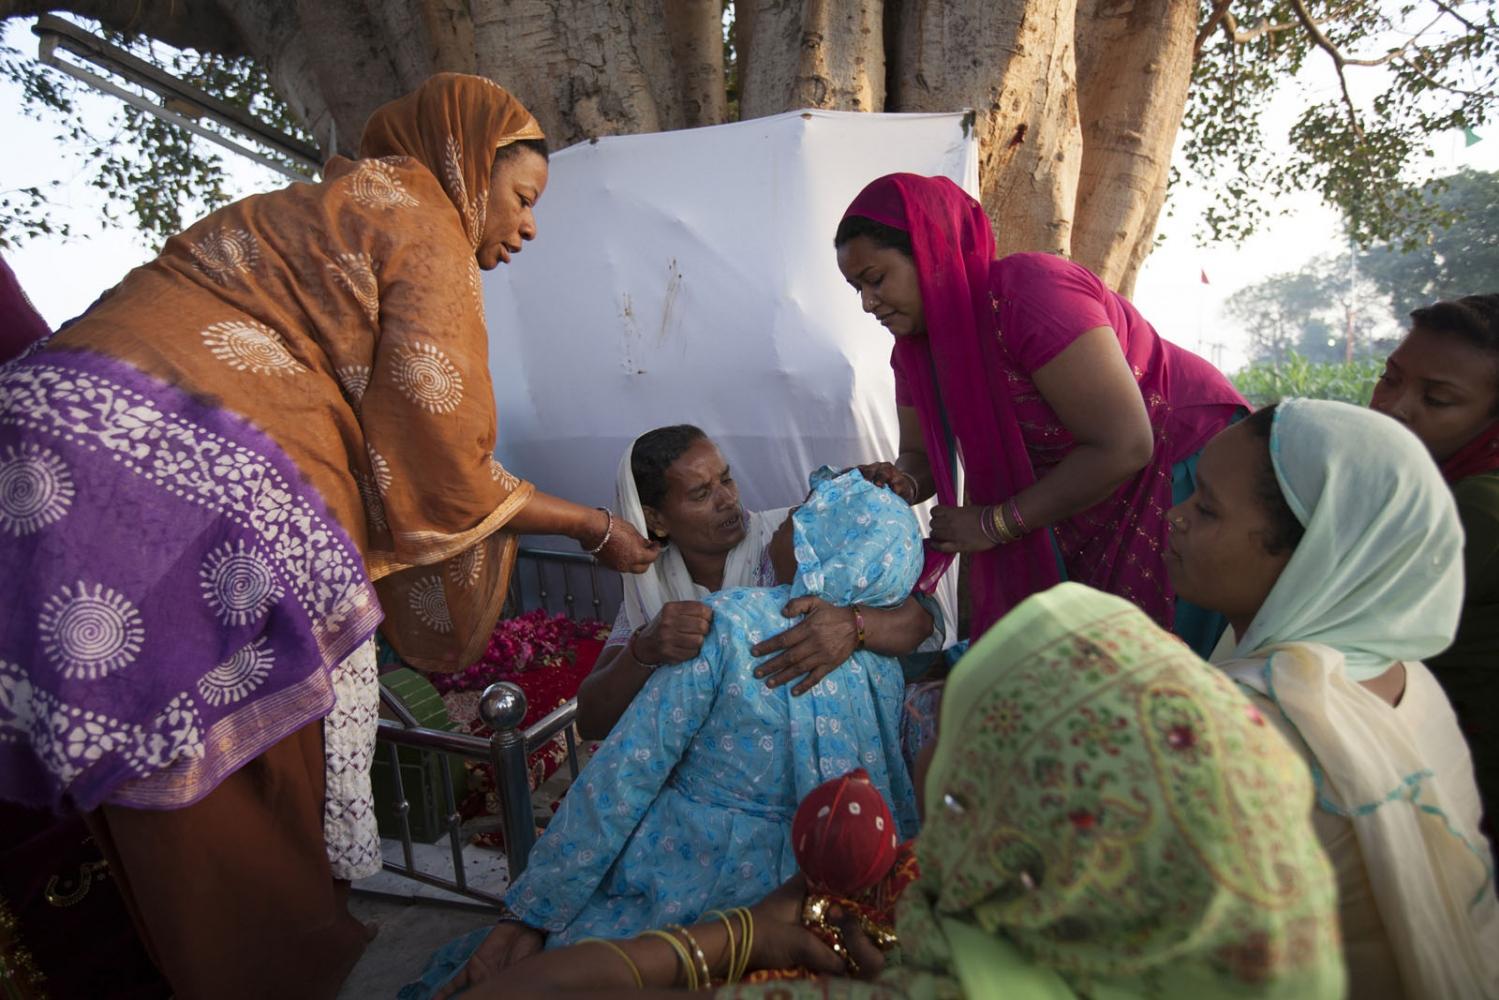 Art and Documentary Photography - Loading Sidi_SouthAsia08.JPG